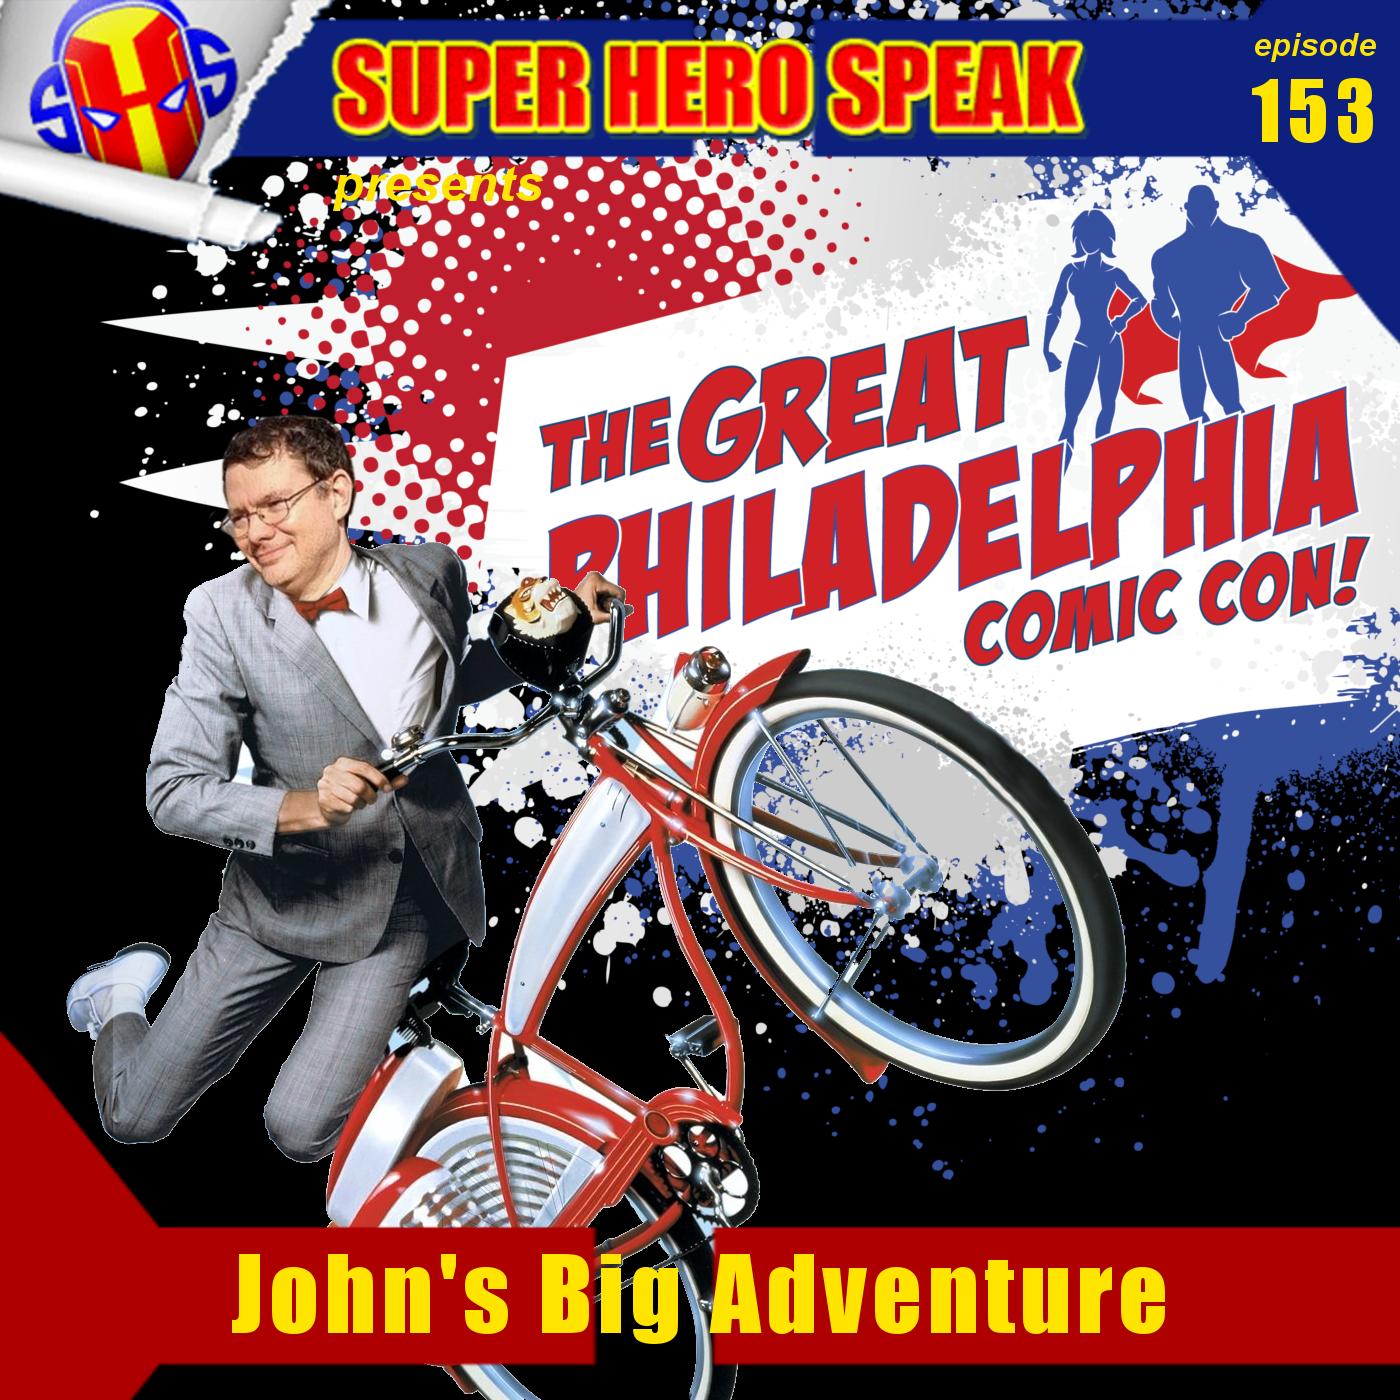 #153: GPCC 2: John's Big Adventure